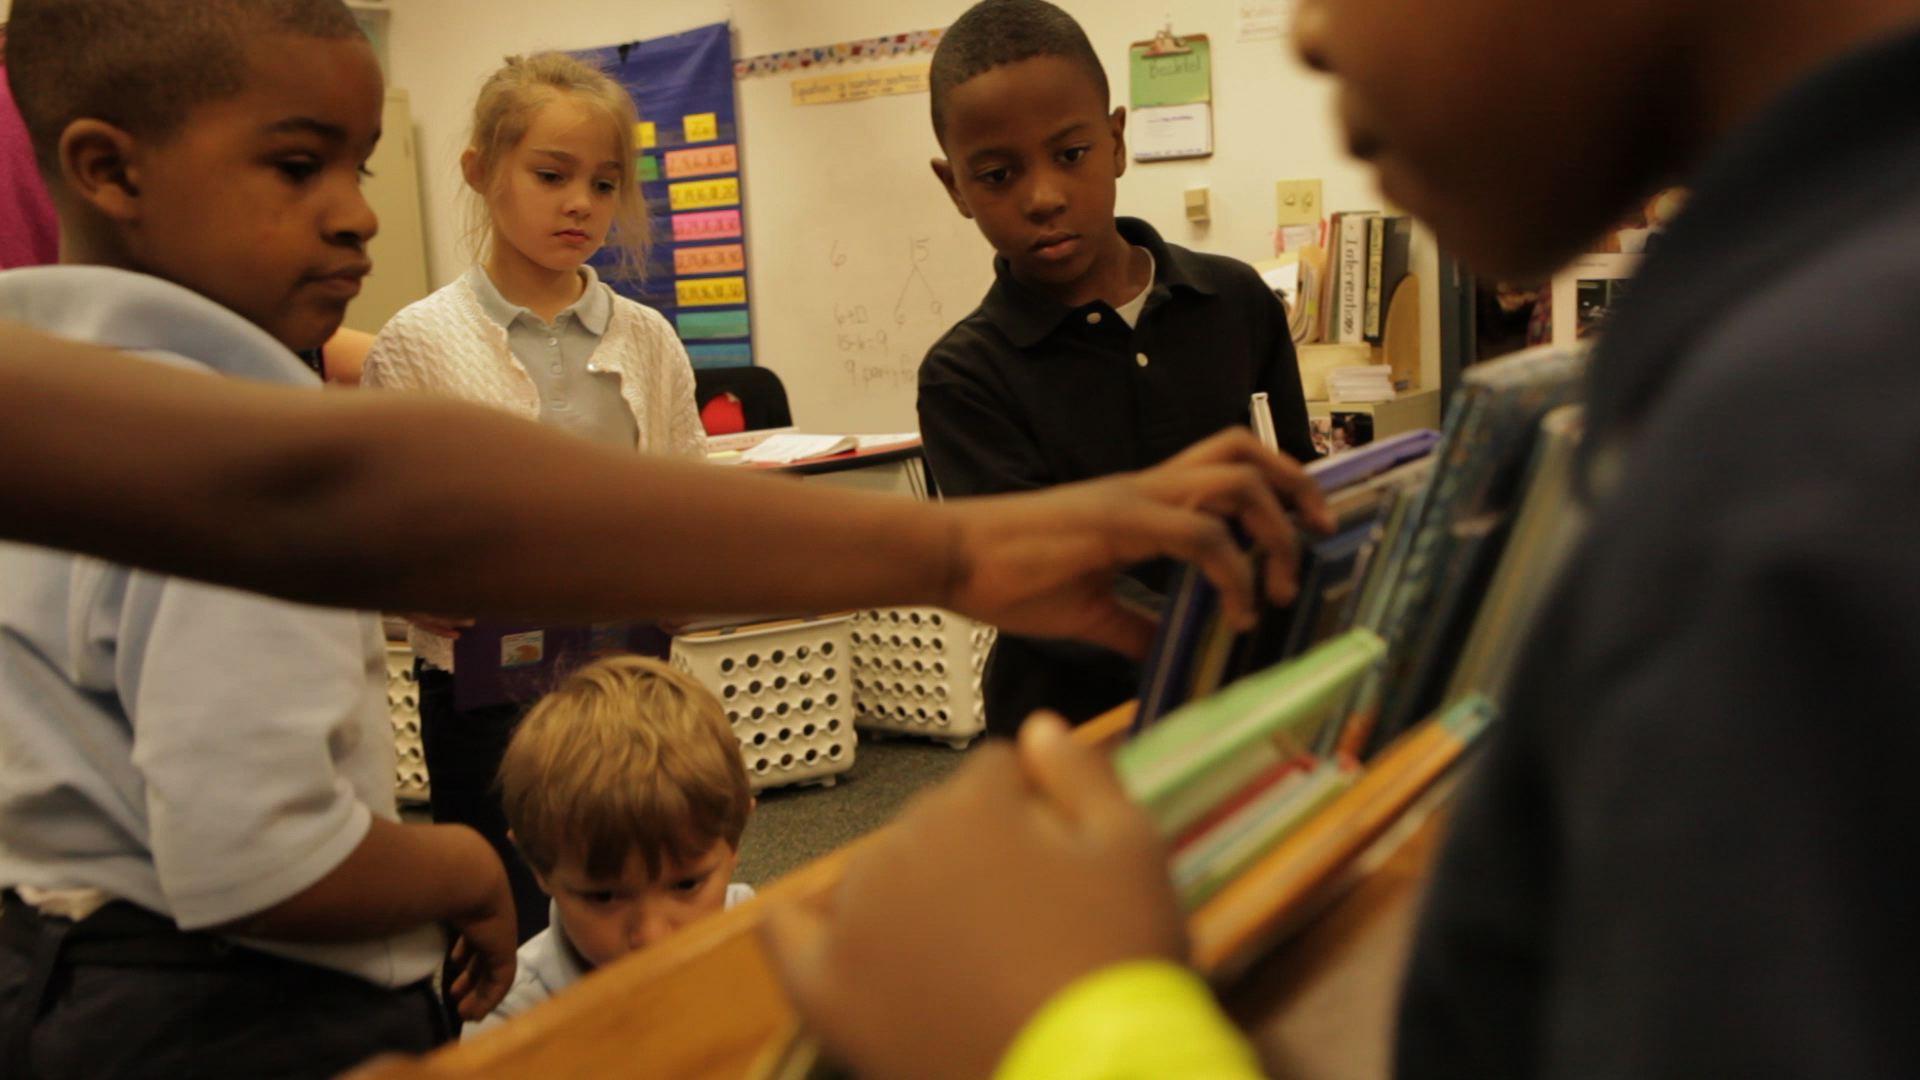 Photo courtesy of Cleveland Schools Book Fund (clevelandschoolsbookfund.org)